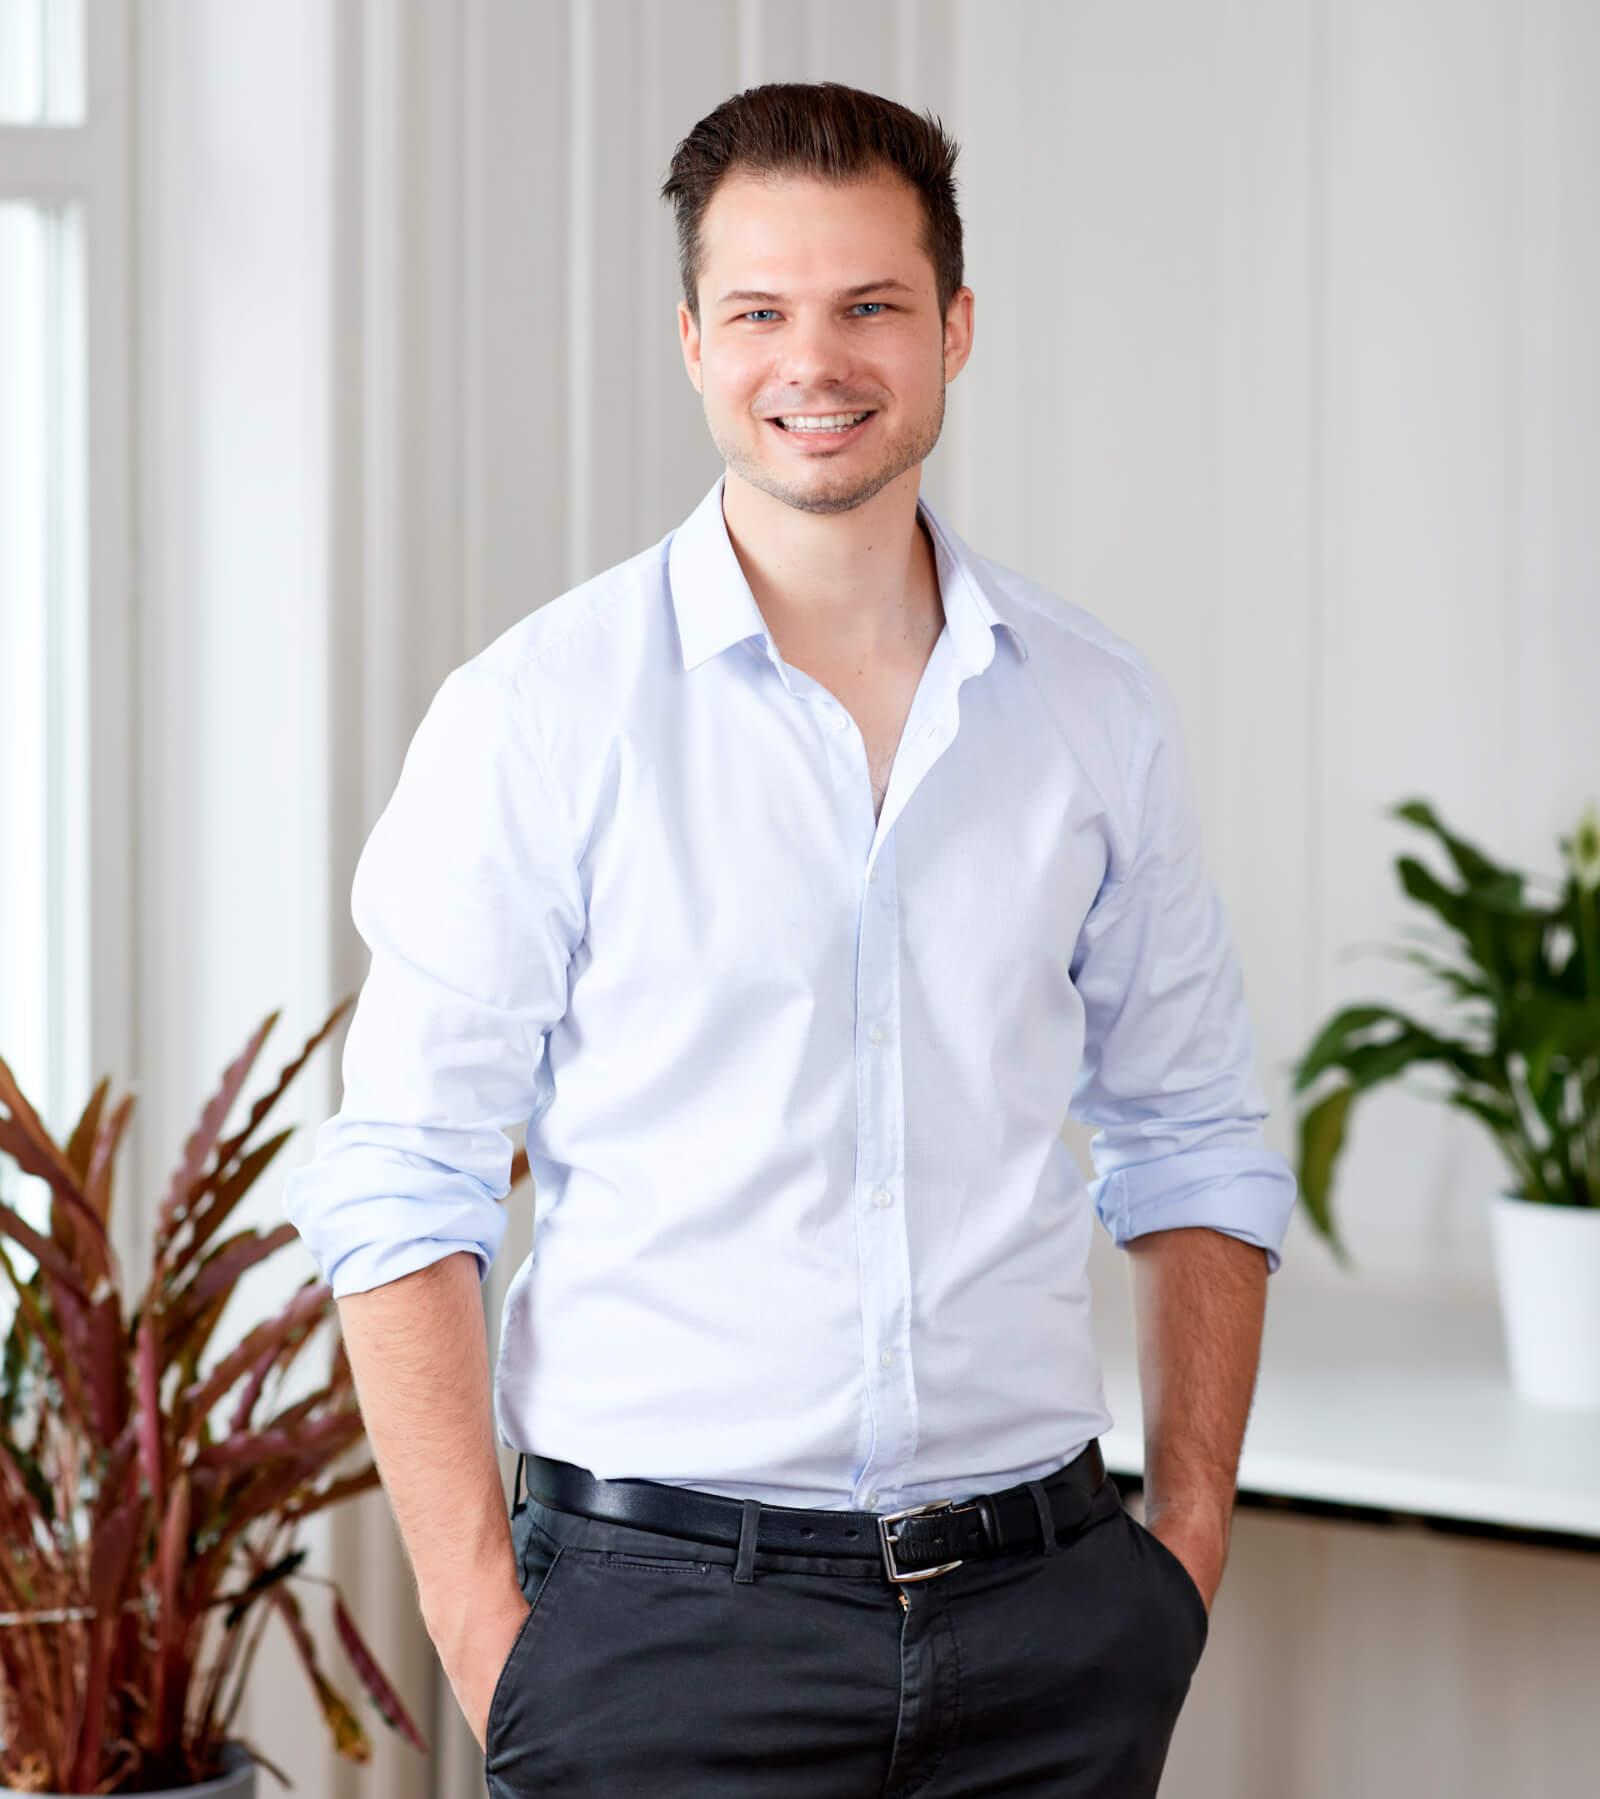 Aaron Meier